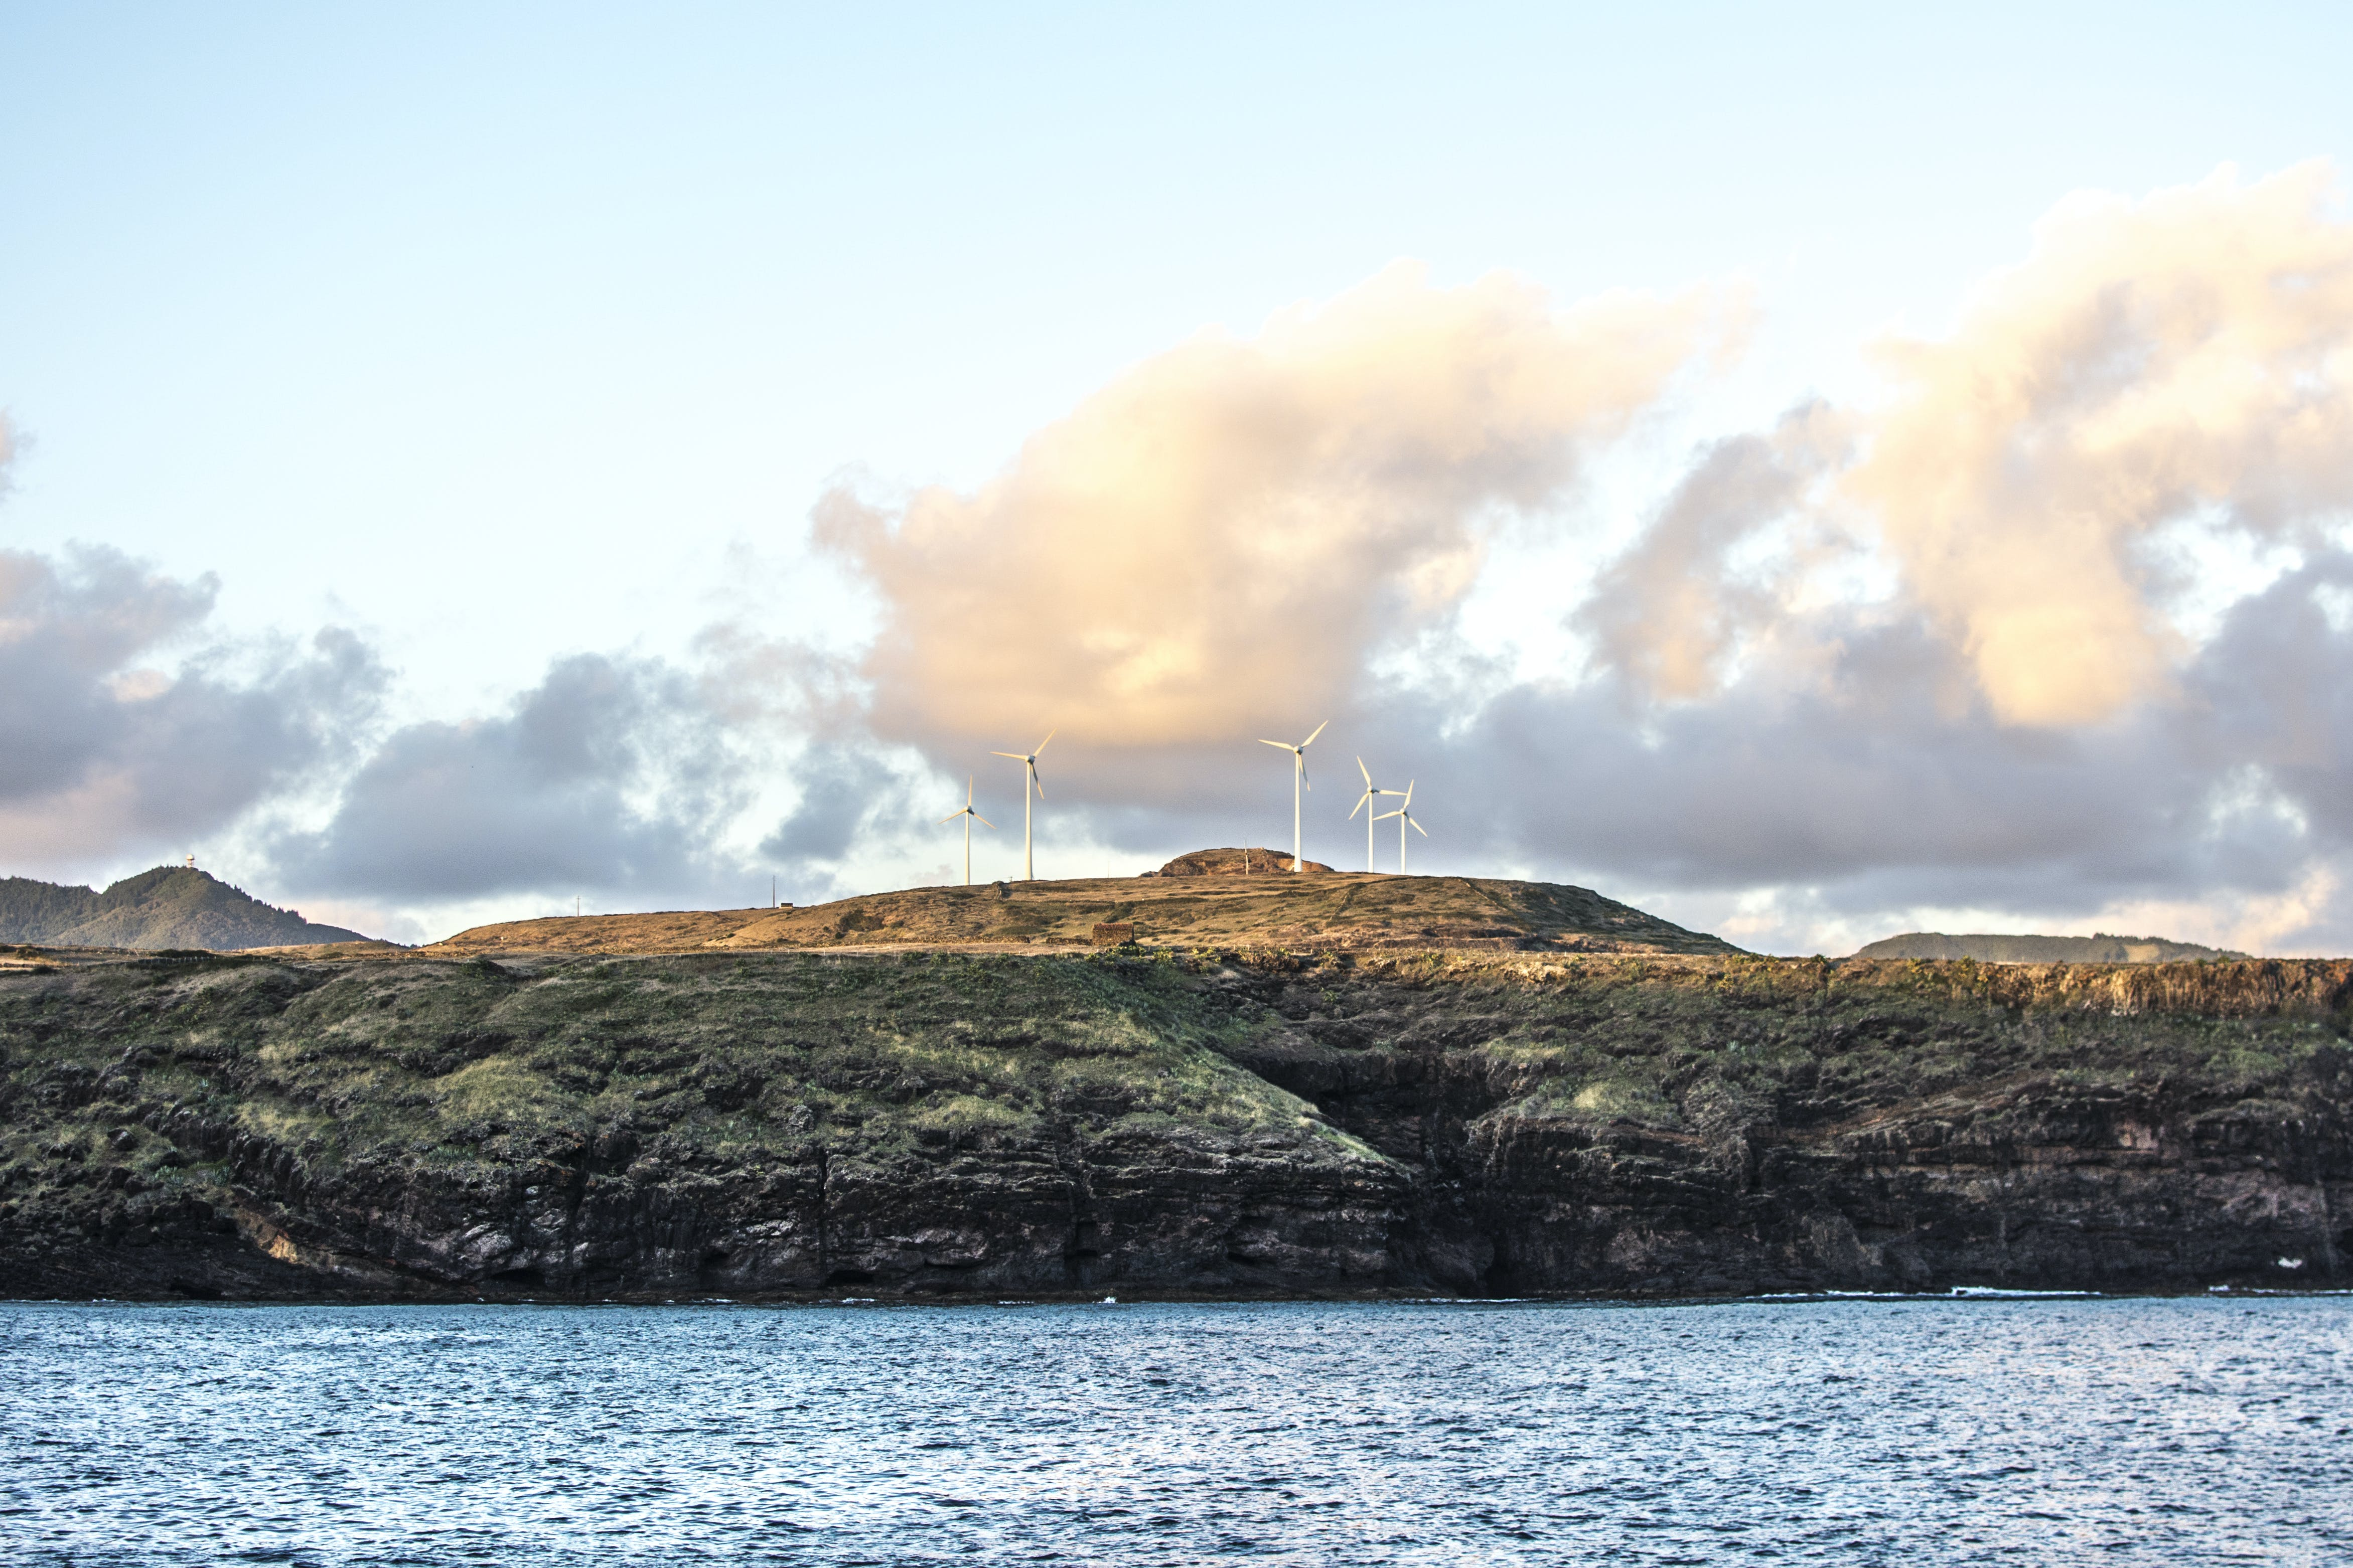 White Windmill Photography